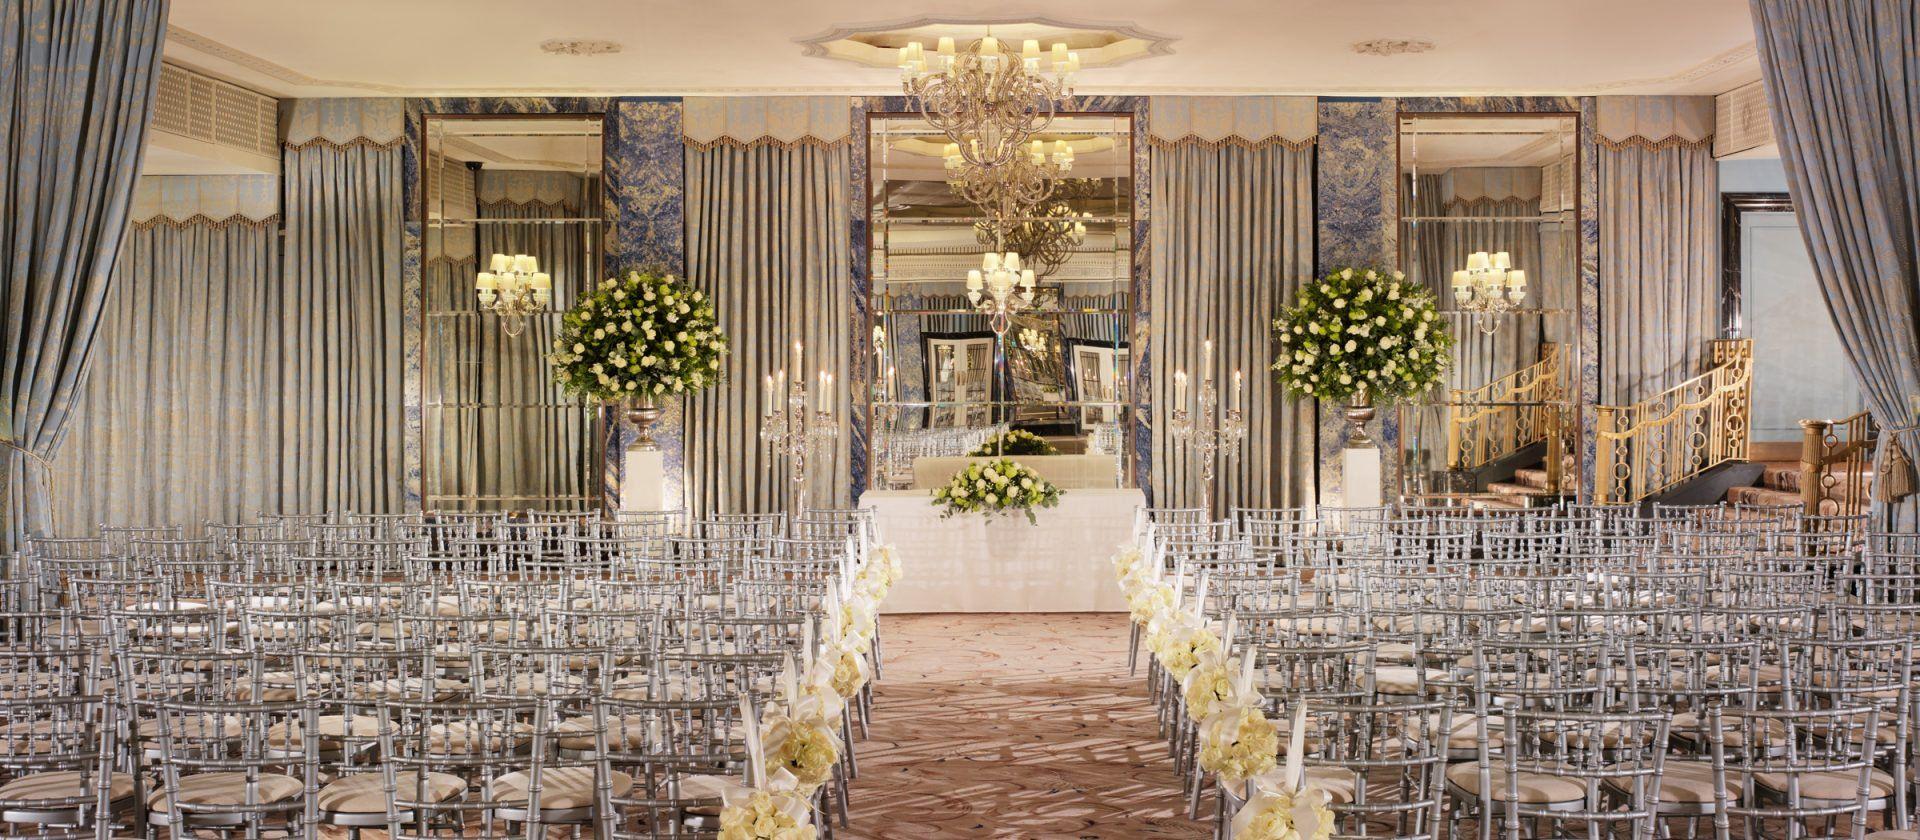 Wedding Venue West London Luxury wedding venues, Hotel